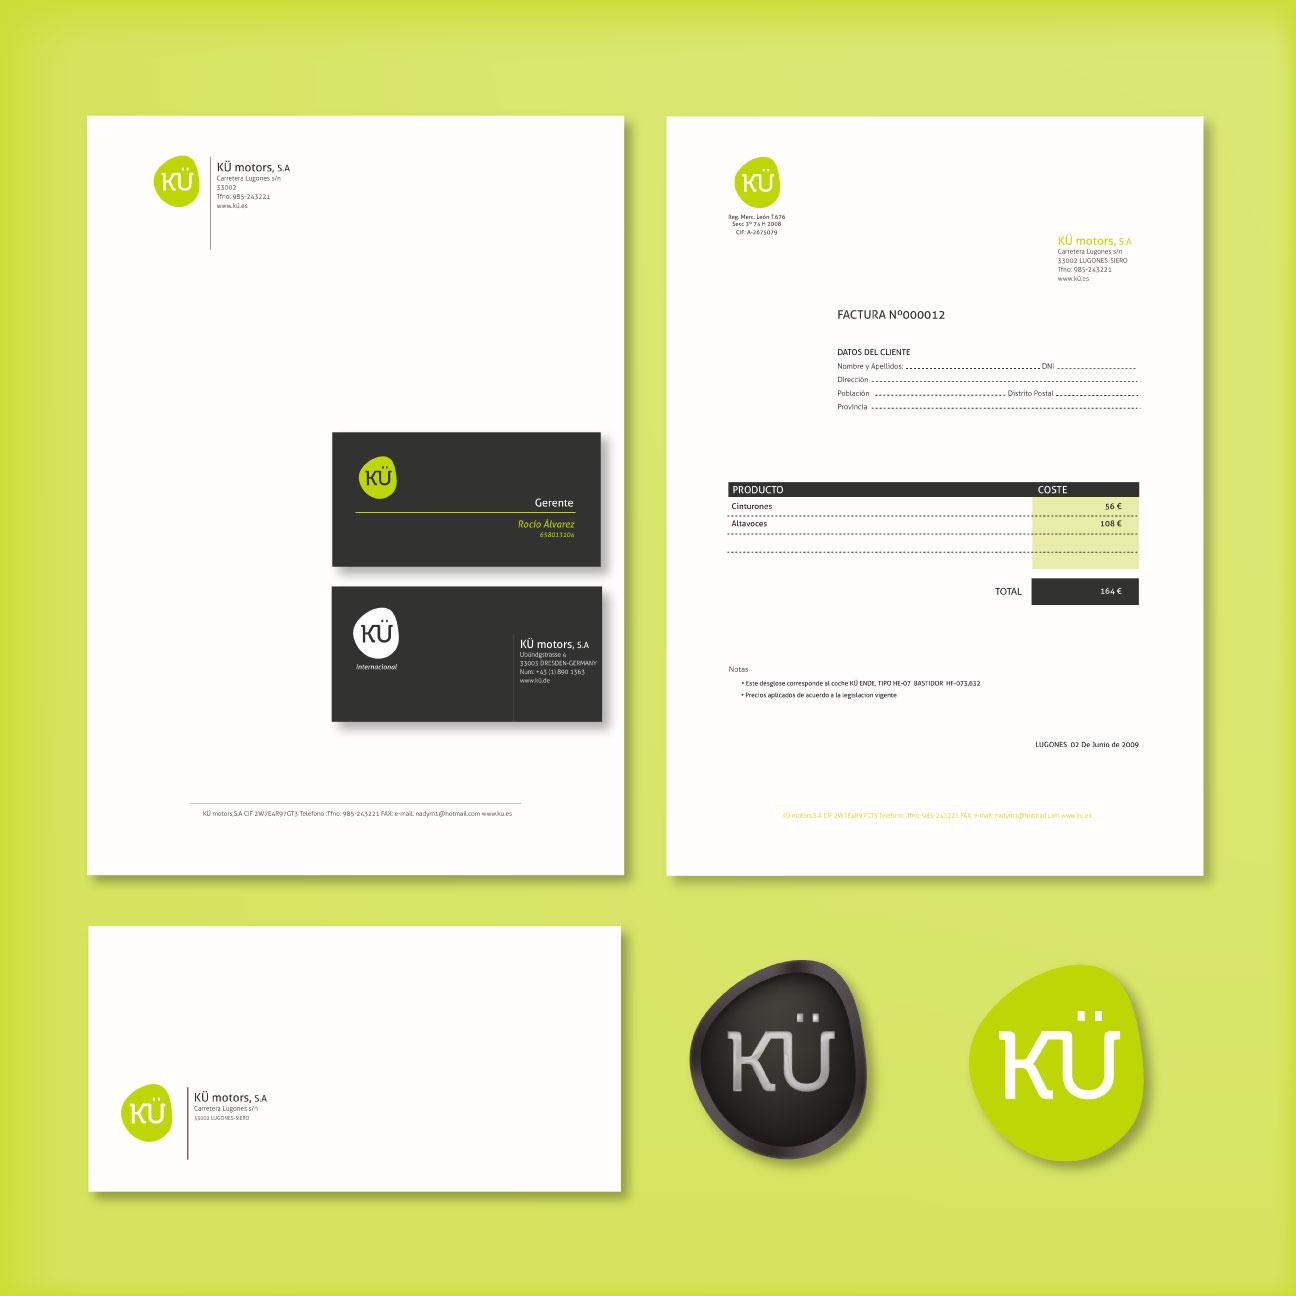 KU_memockup-01-01.jpg